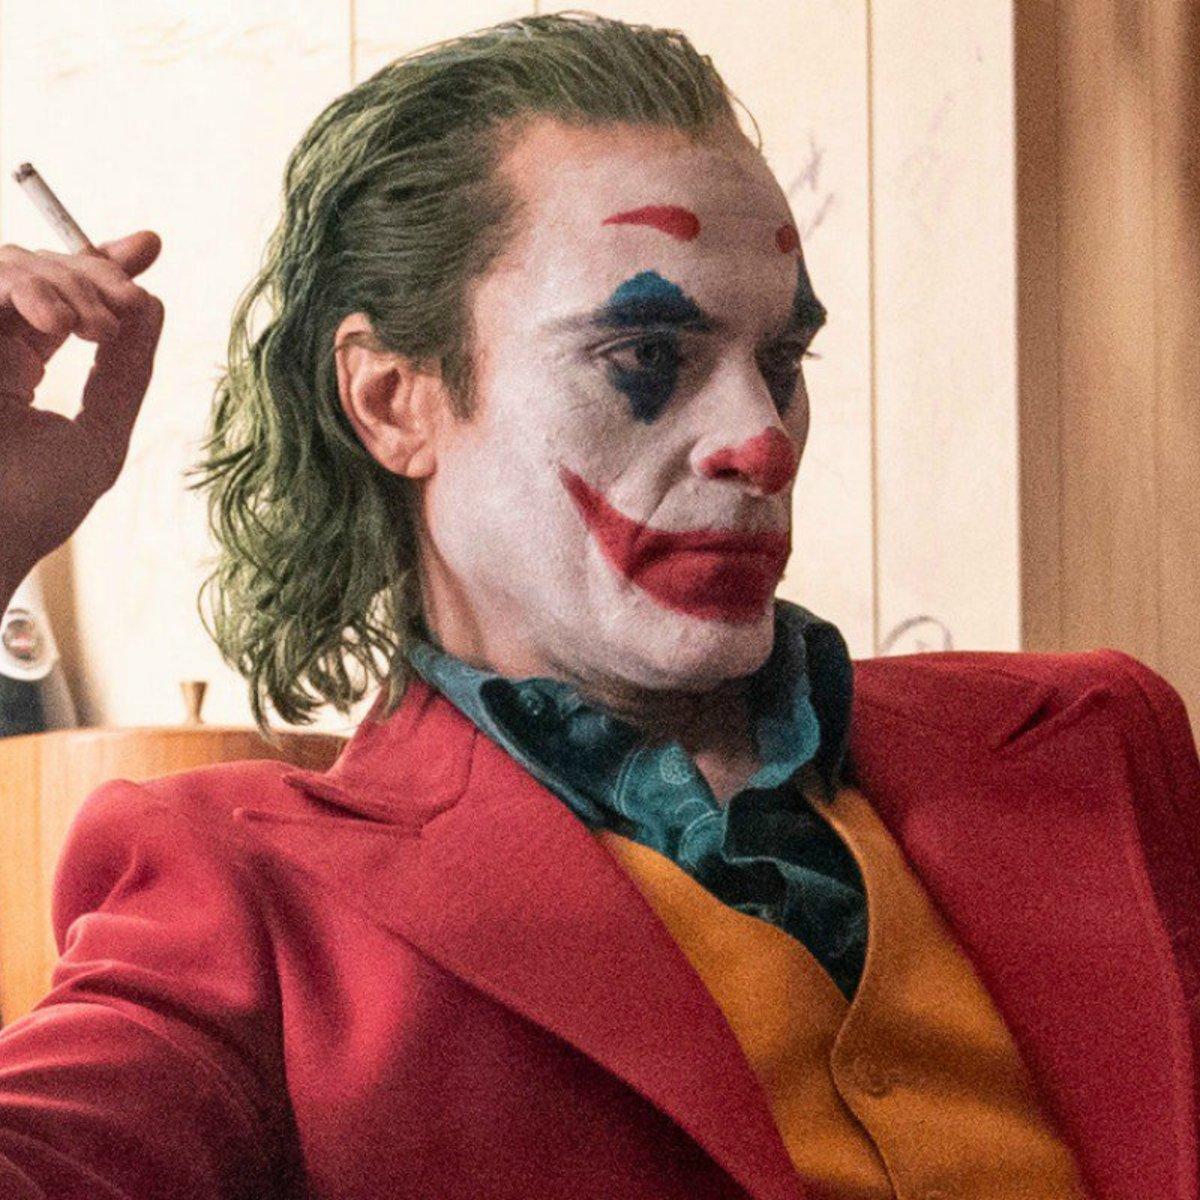 The 20 Biggest Ways Joker Breaks the Superhero Mold